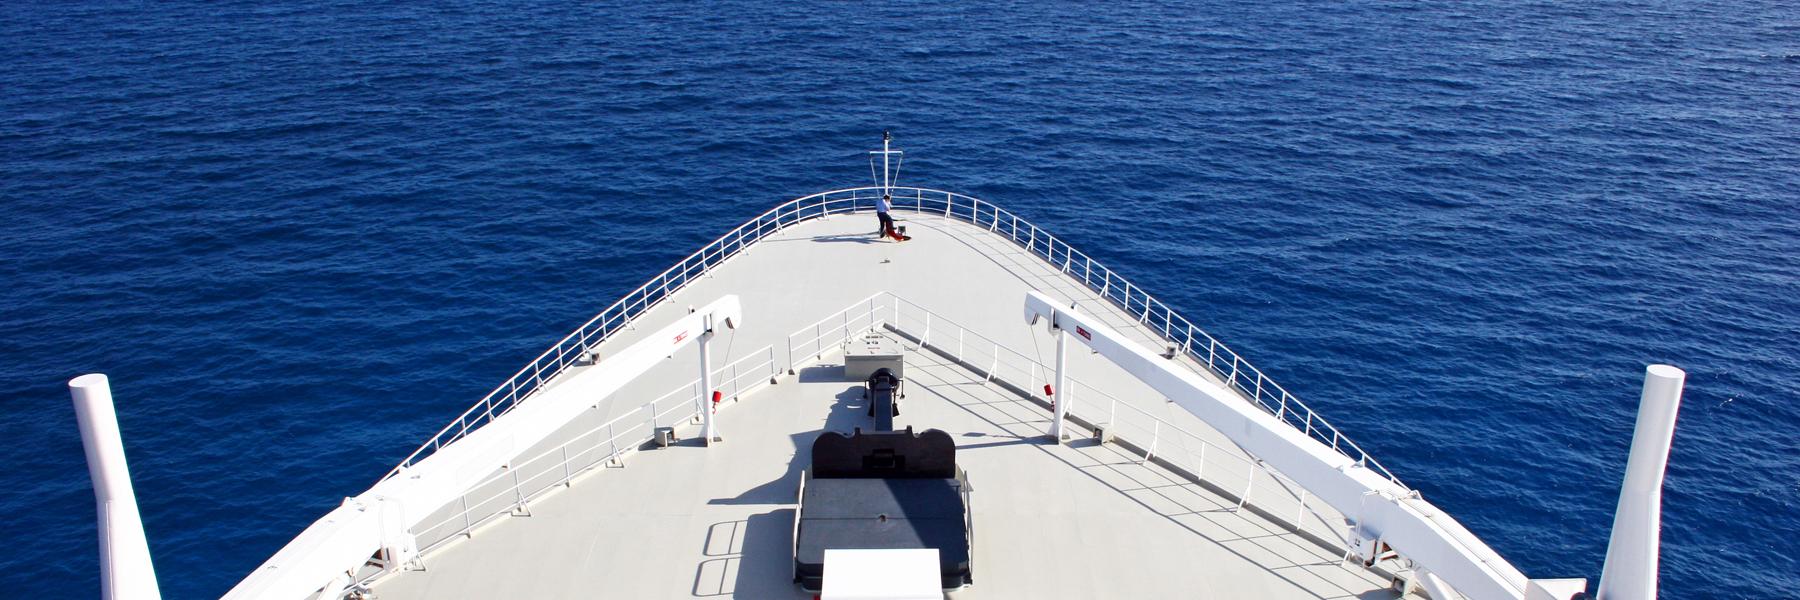 VesselMonitoring.jpg